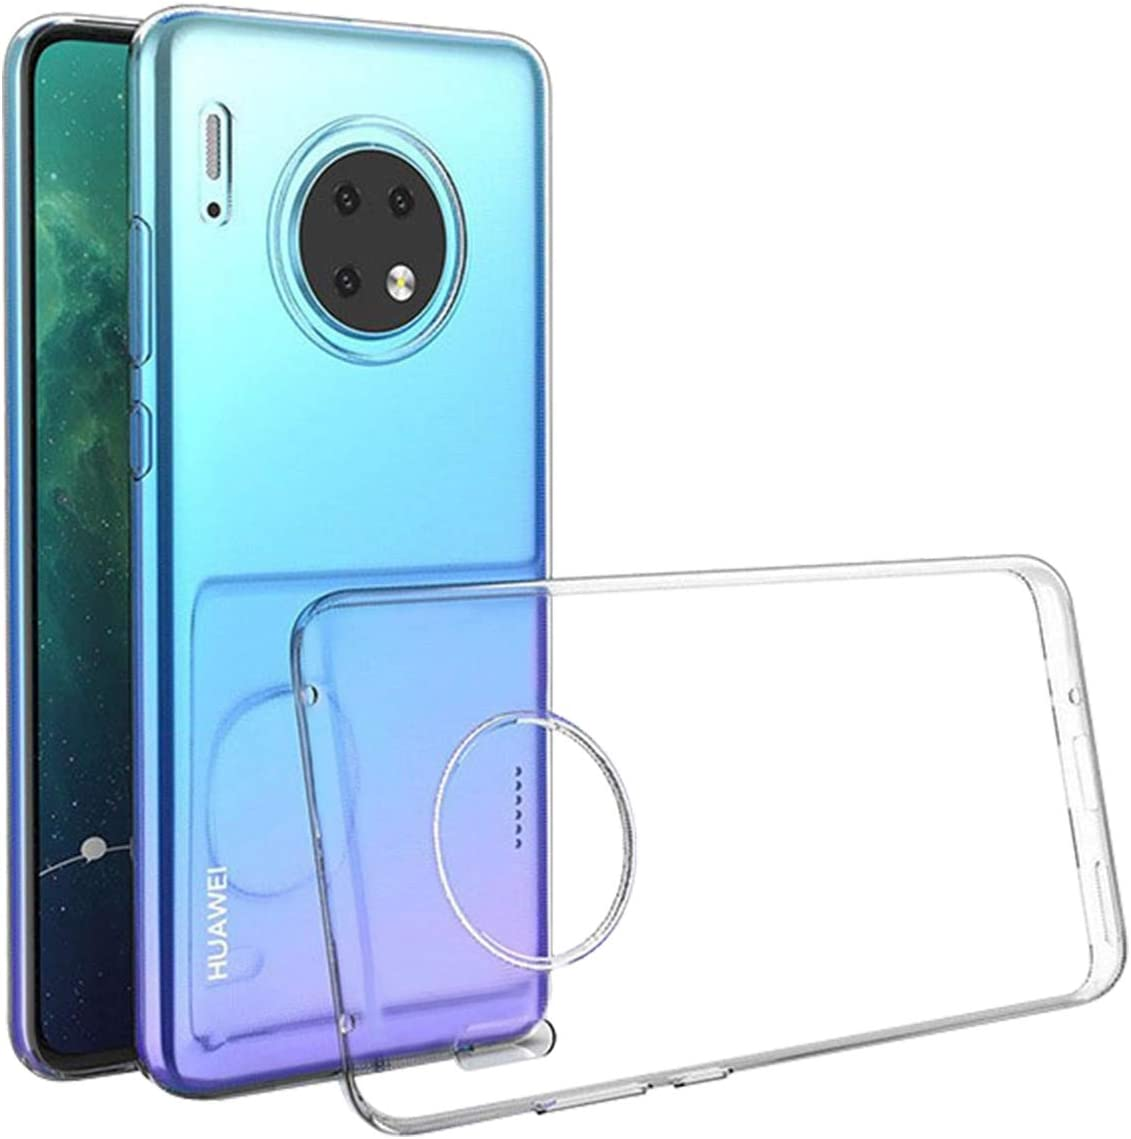 Funda para Huawei Mate 30 Pro Case Slim Transparente con Función ...